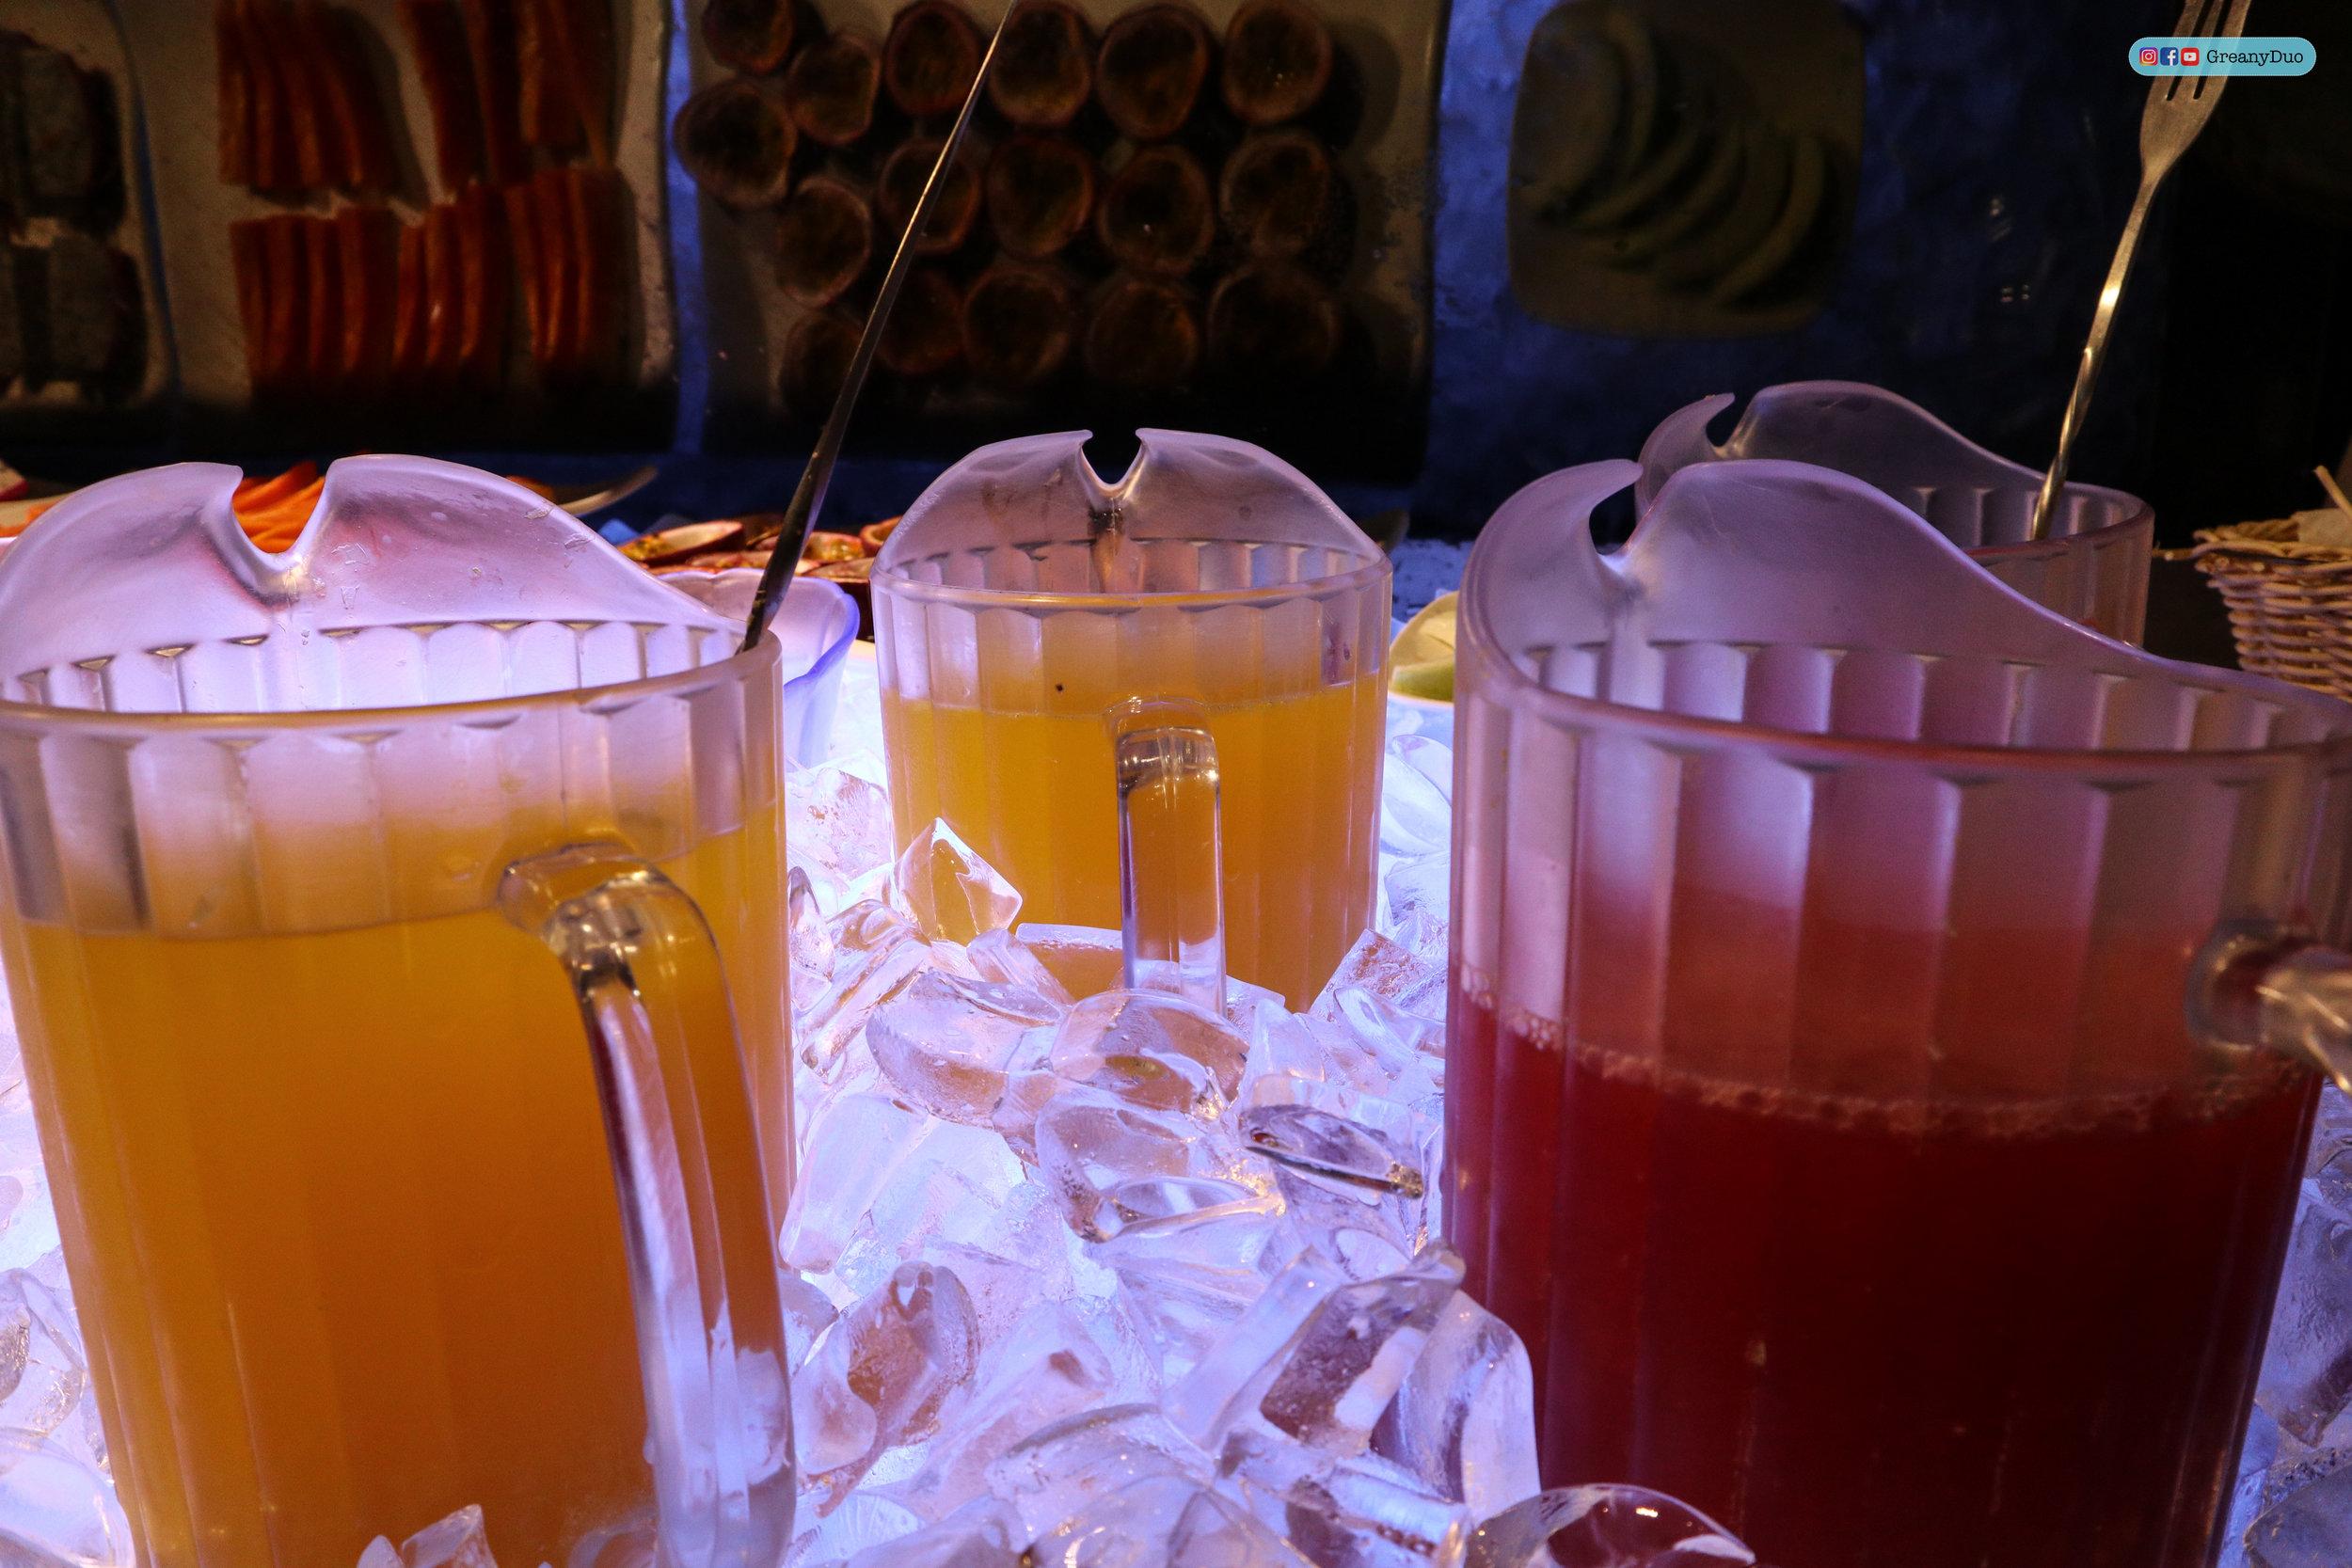 fresh juice at บุฟเฟ่ต์ชาบูไต้หวันที่ Hakkai Shabu Shabu ซีเหมินติง